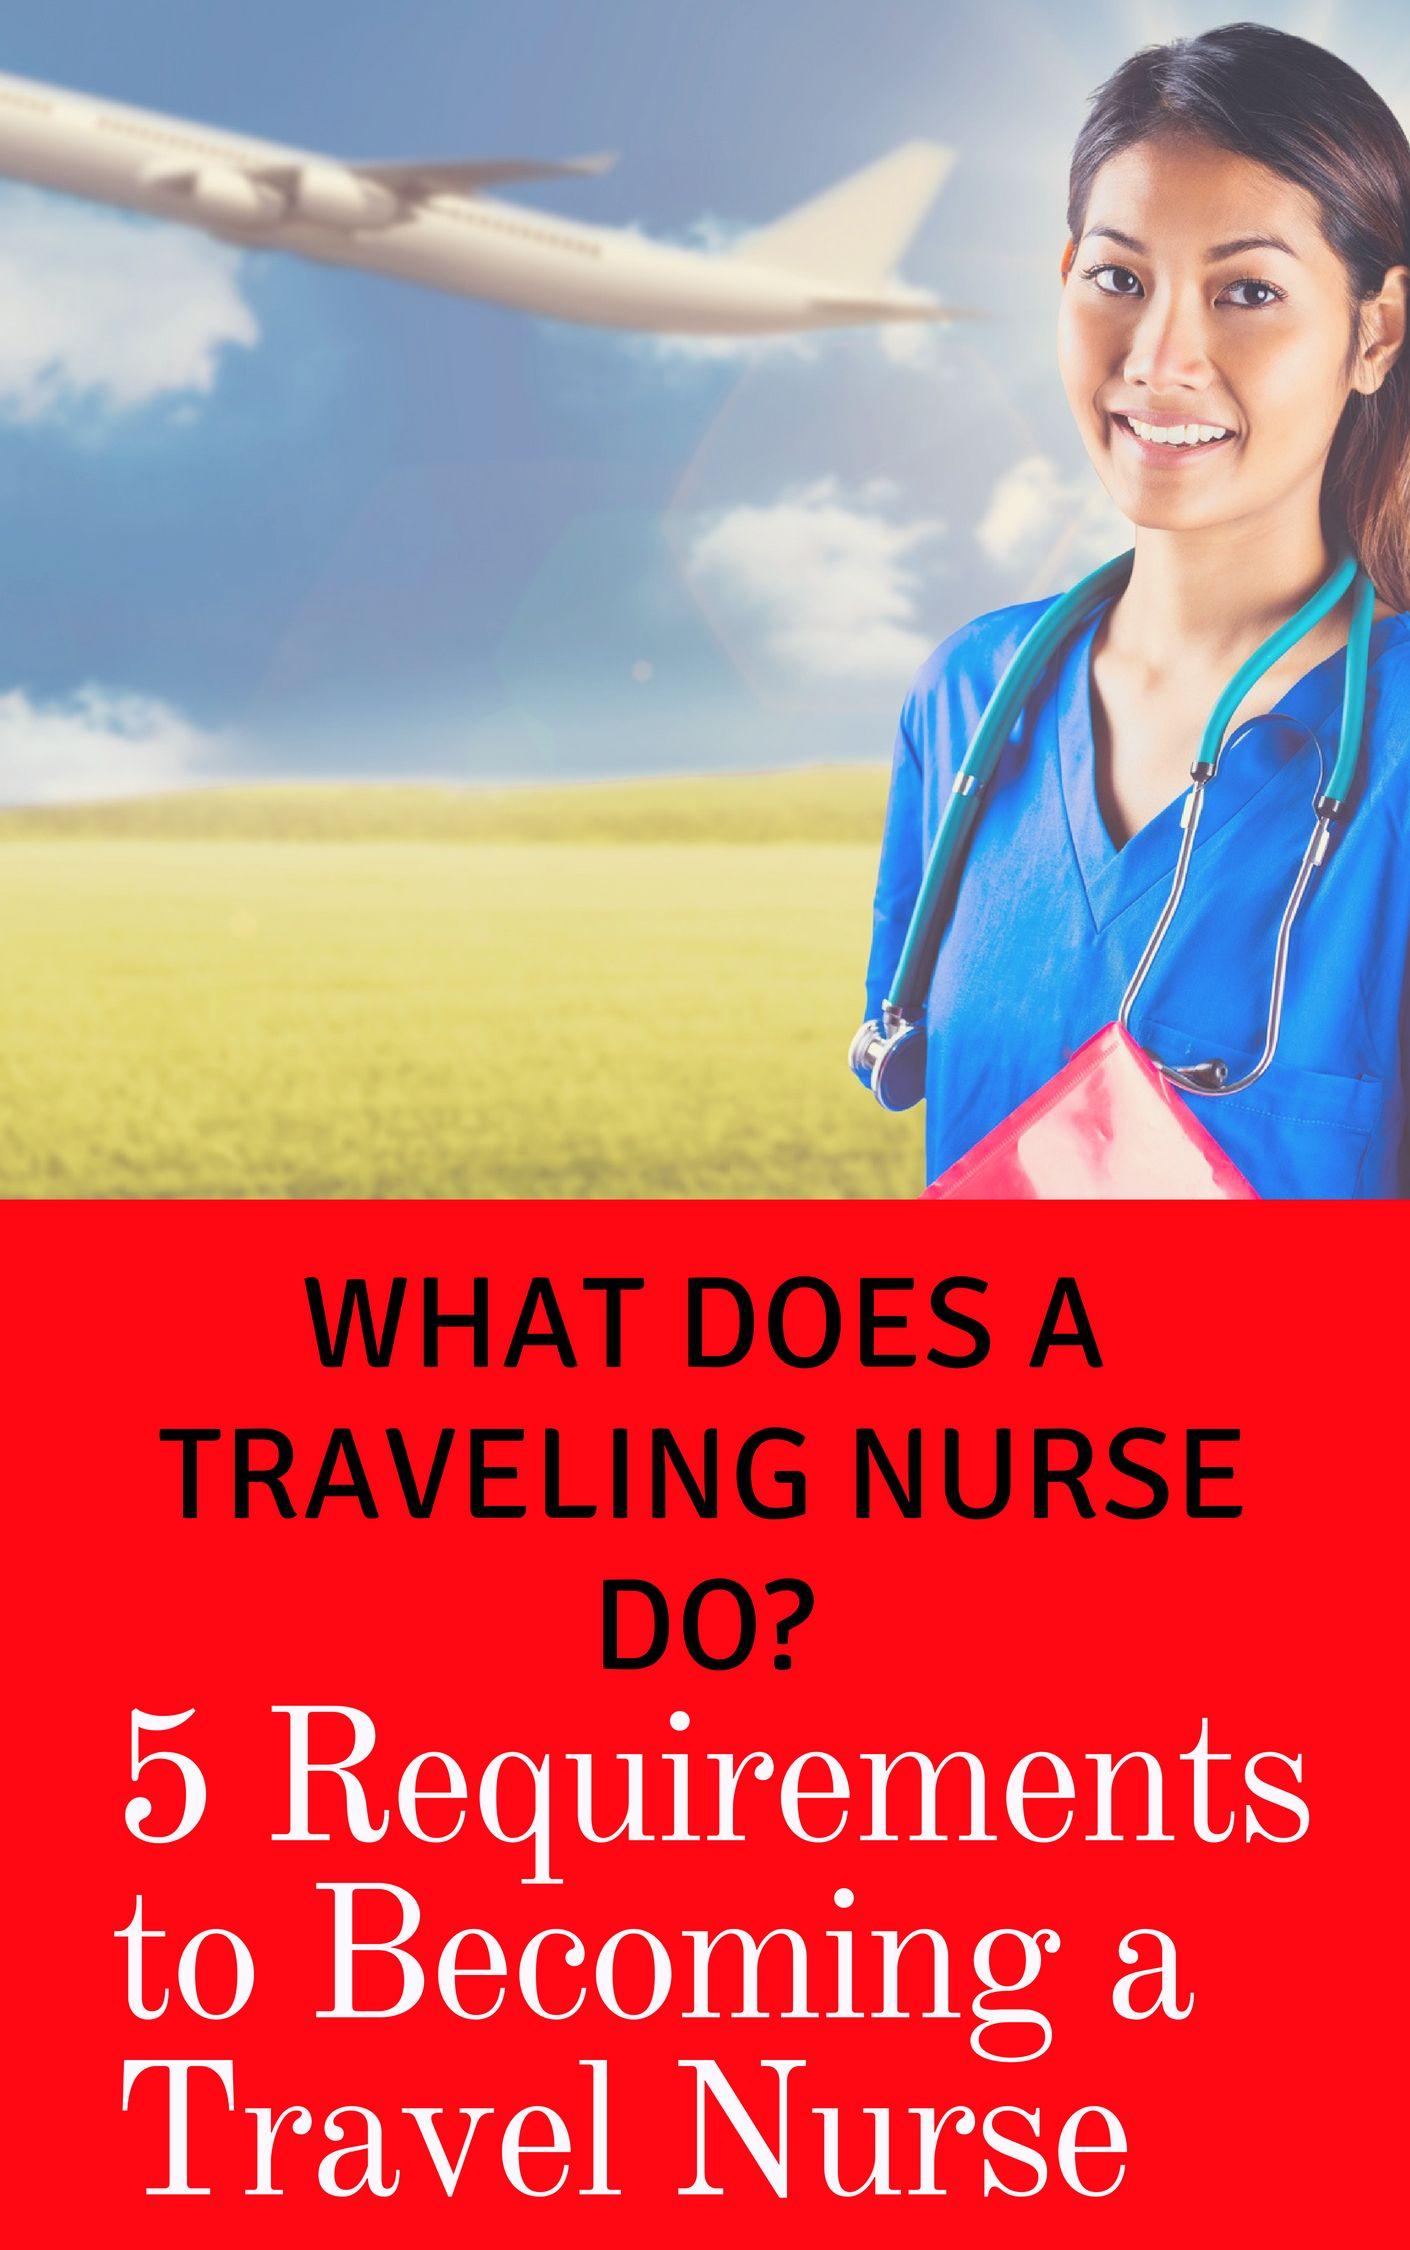 Travel Nurse Salary, Job Description, Duties and